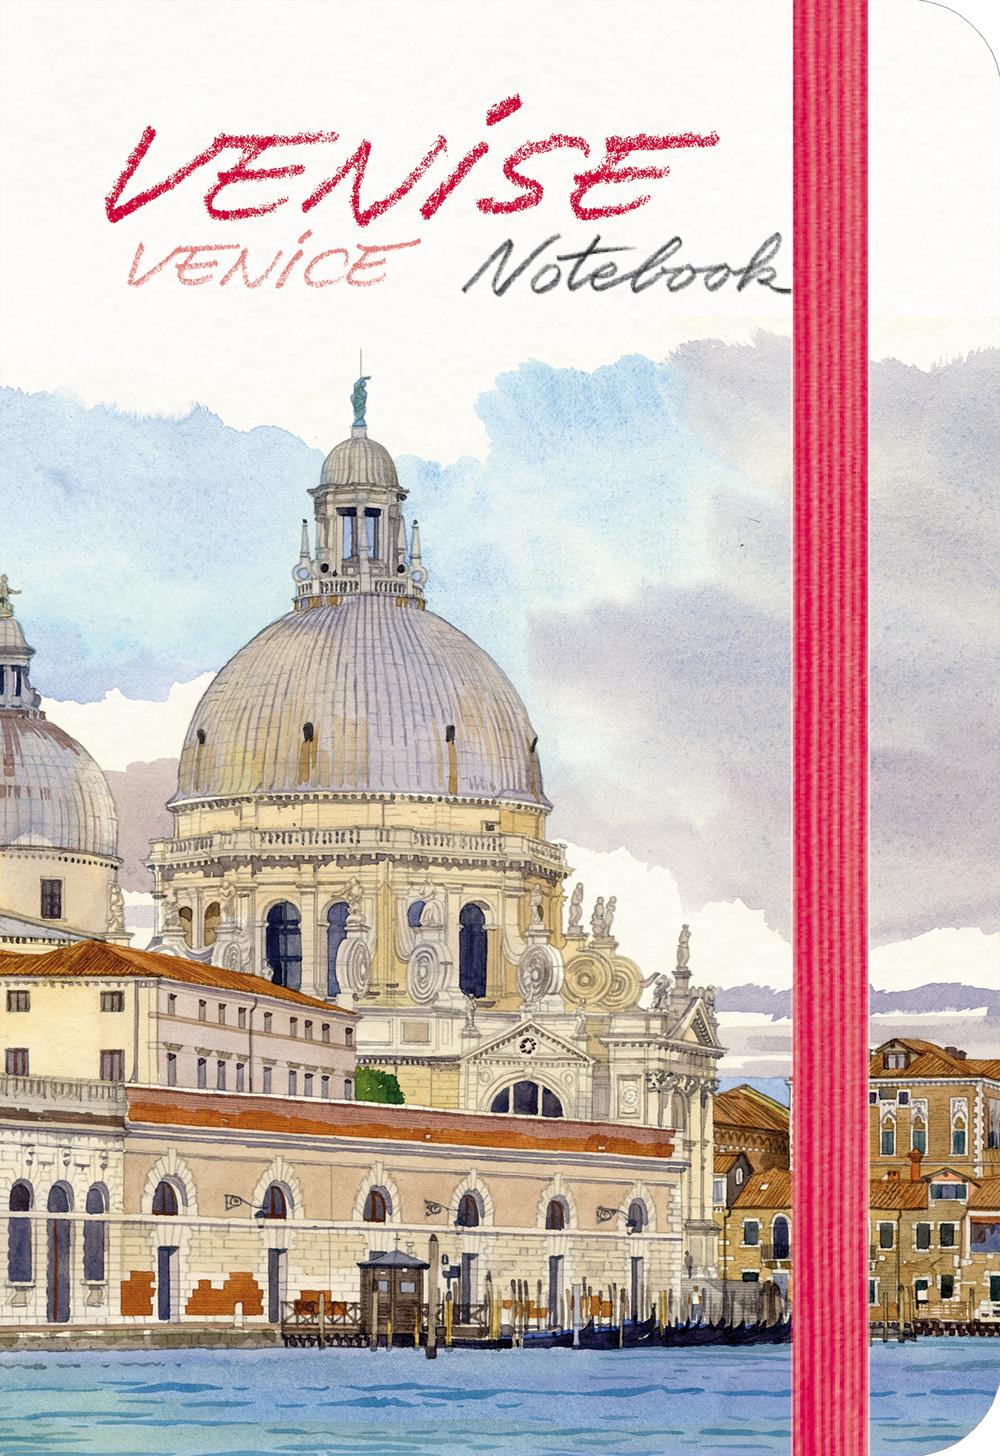 Venise Notebook